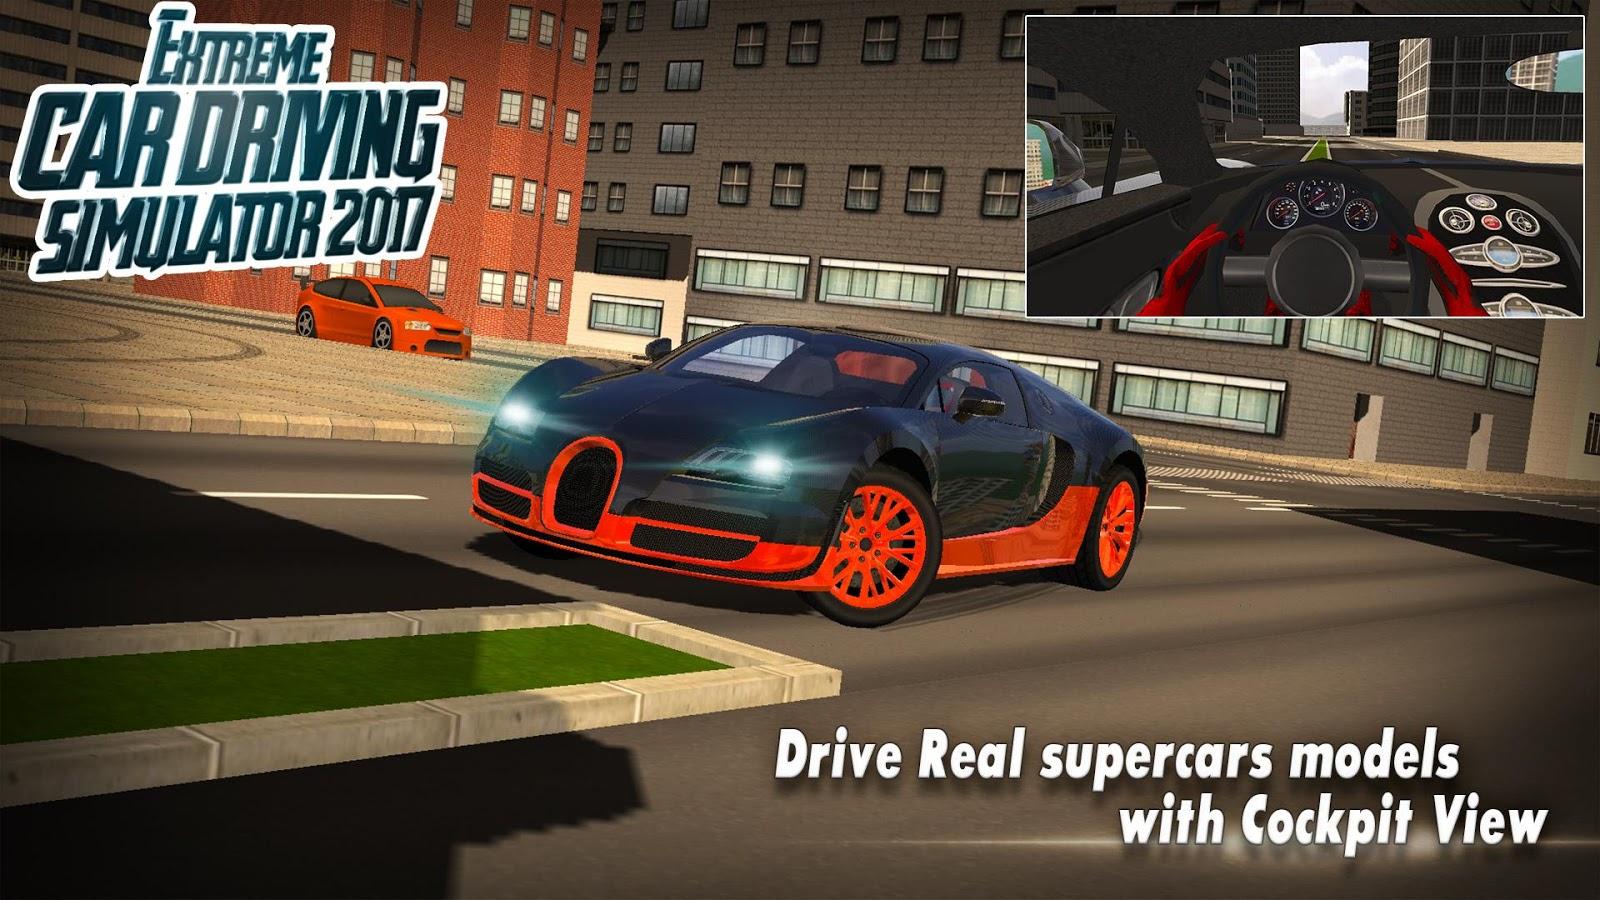 Extreme Car Driving Simulator 2 v1.0.3 Mod Apk ( Unlimited